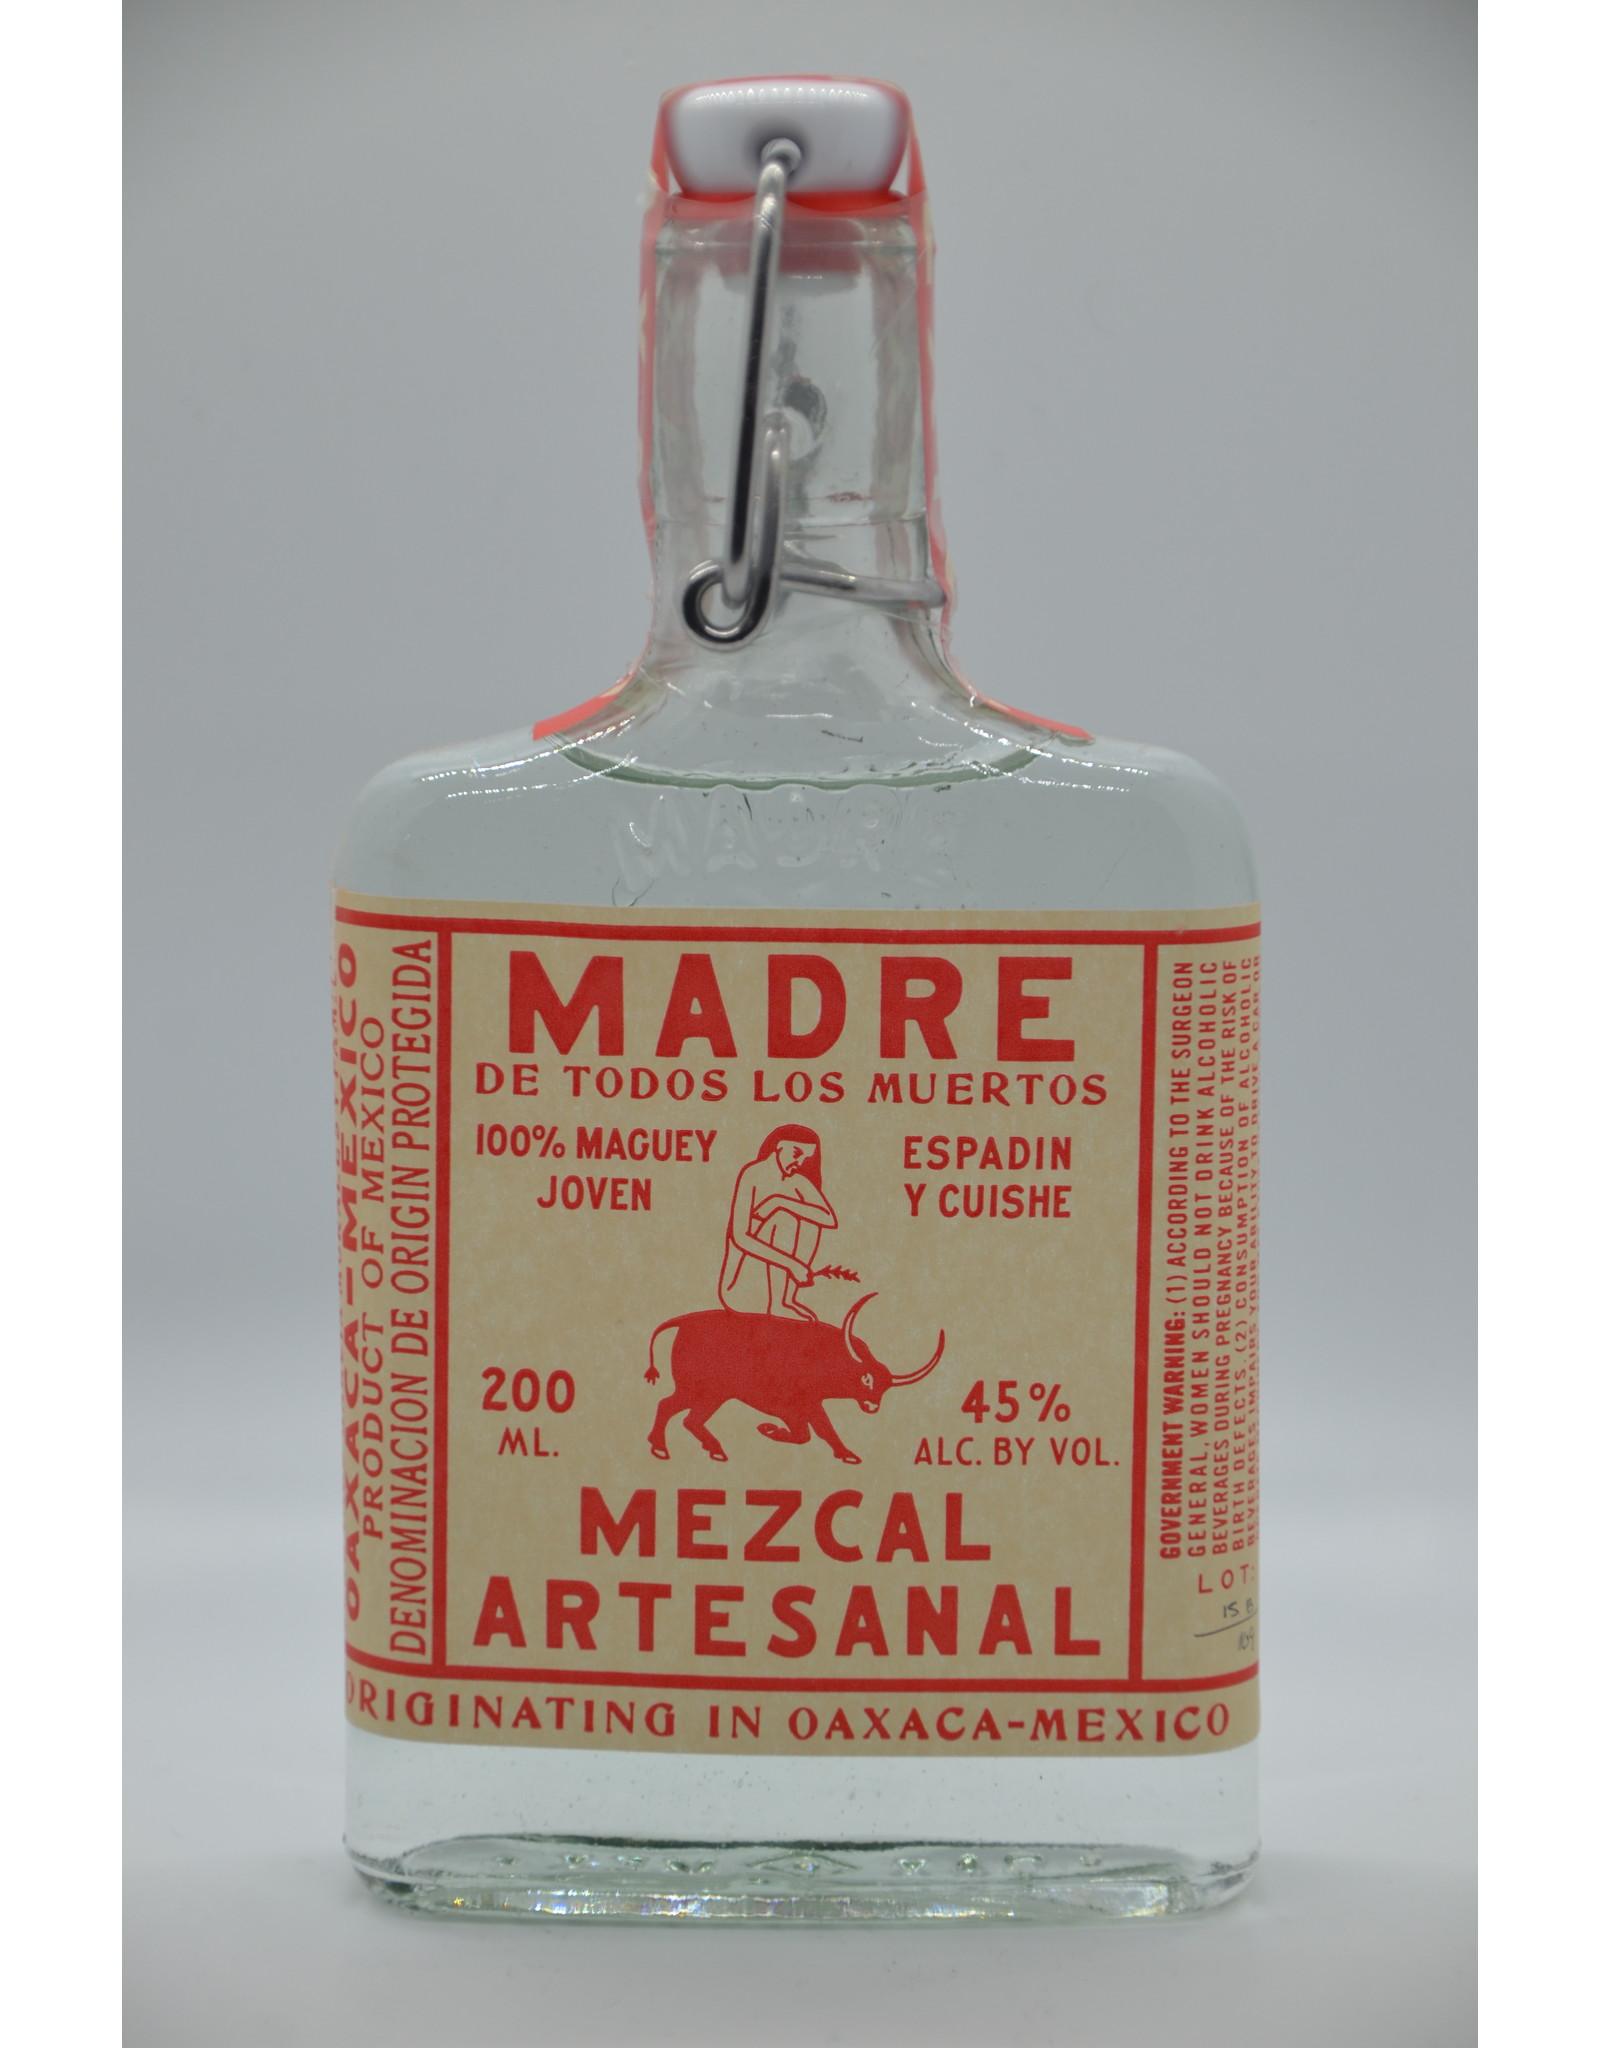 Mexico Madre Mezcal Artesanal 200ml